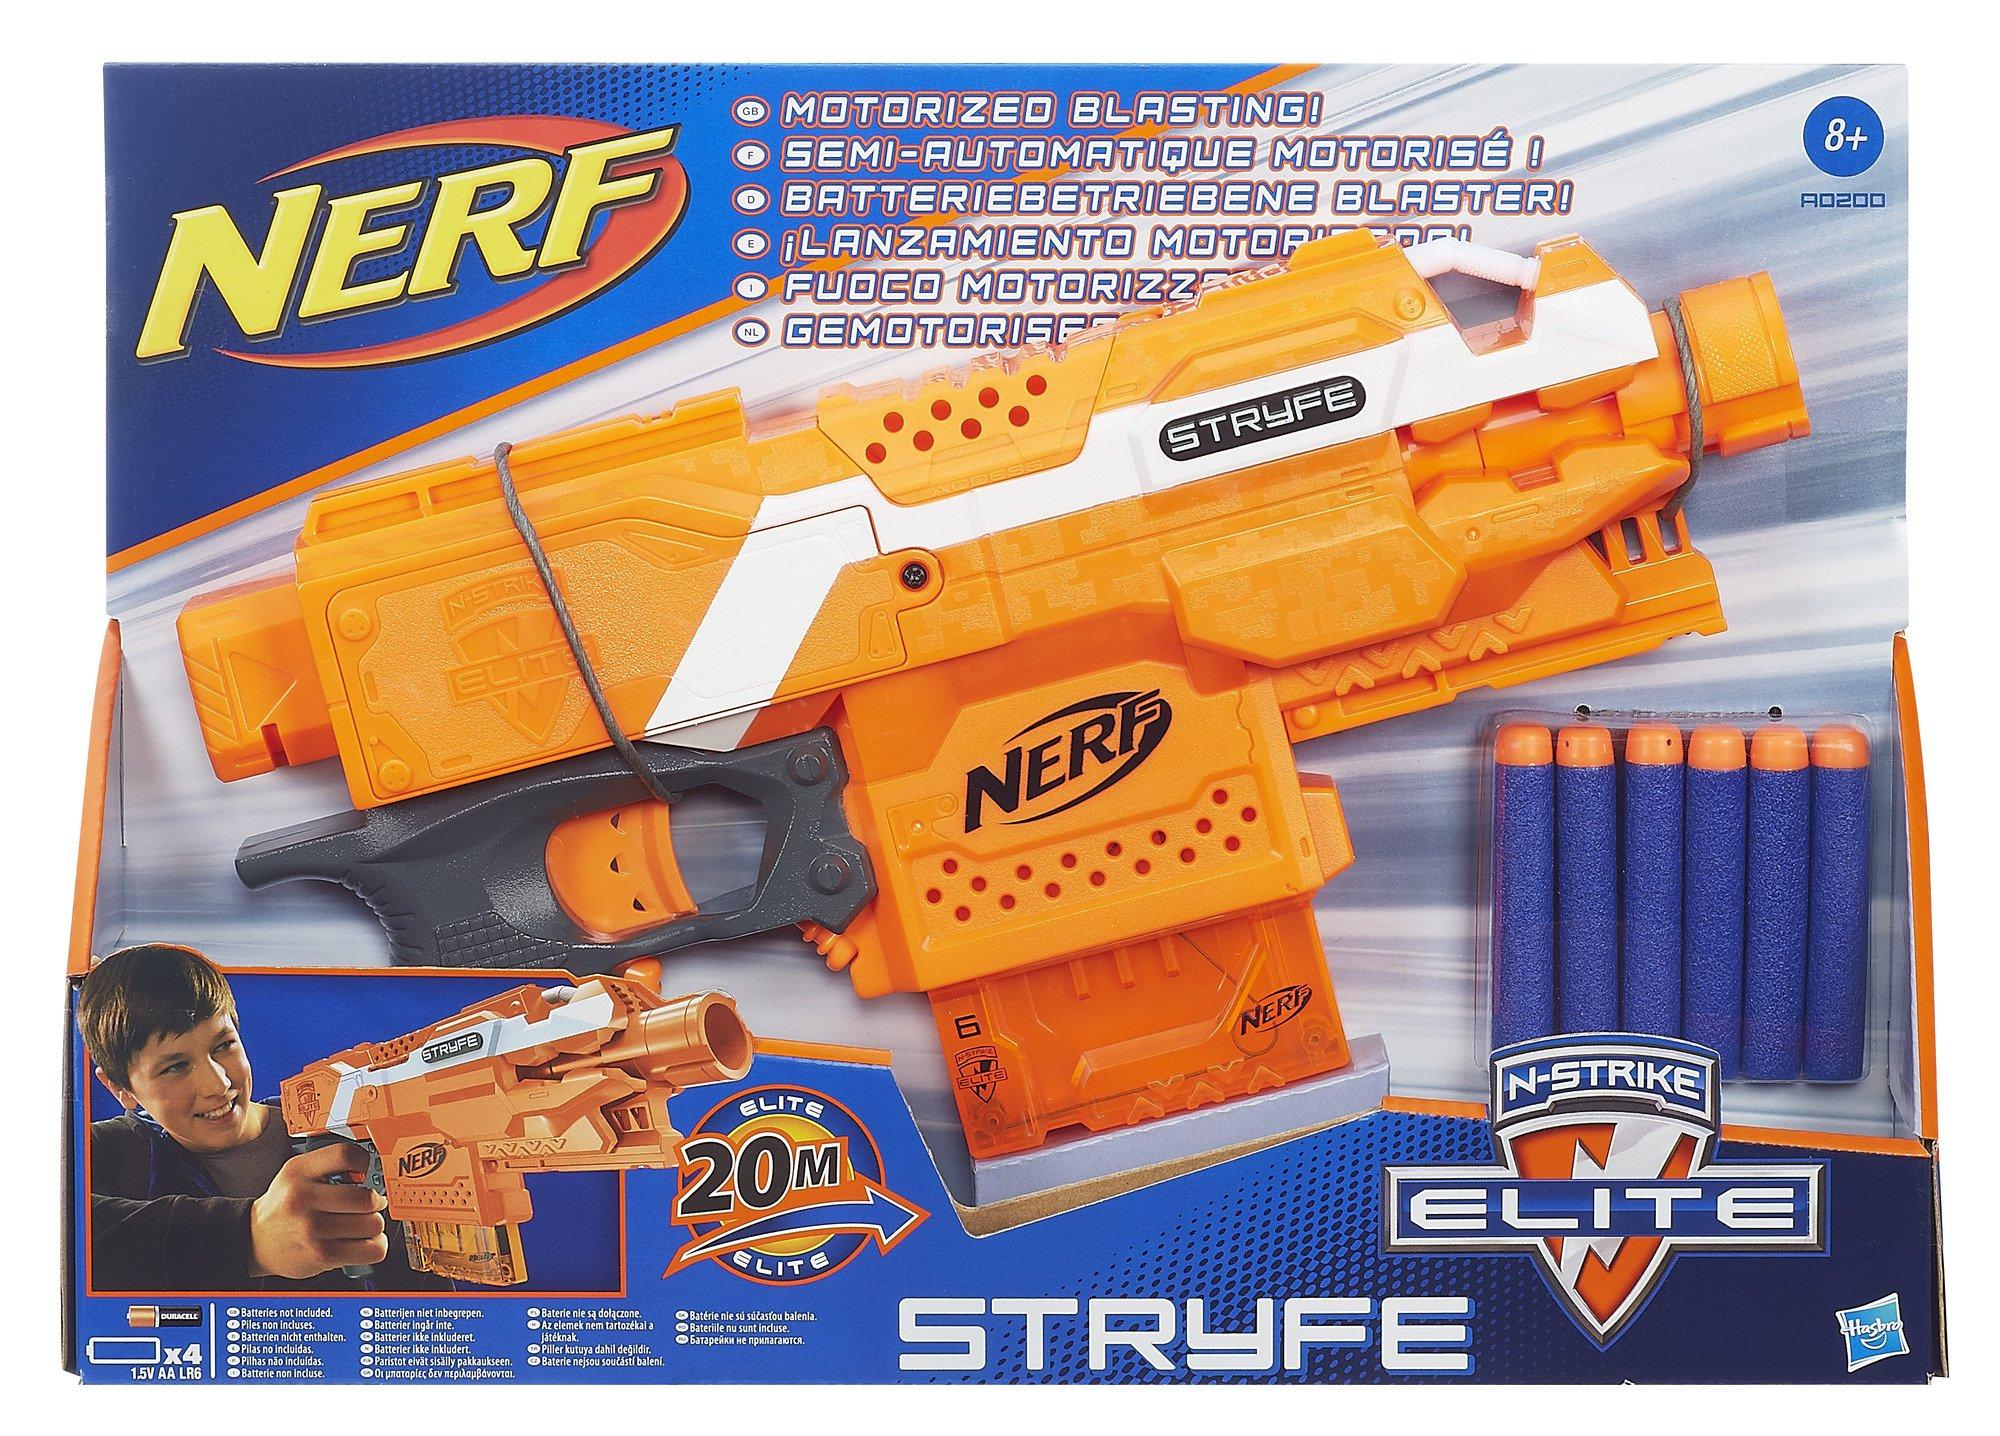 Nerf stryfe blaster classic 1 ebay for Nerf motorized rapid fire blasting